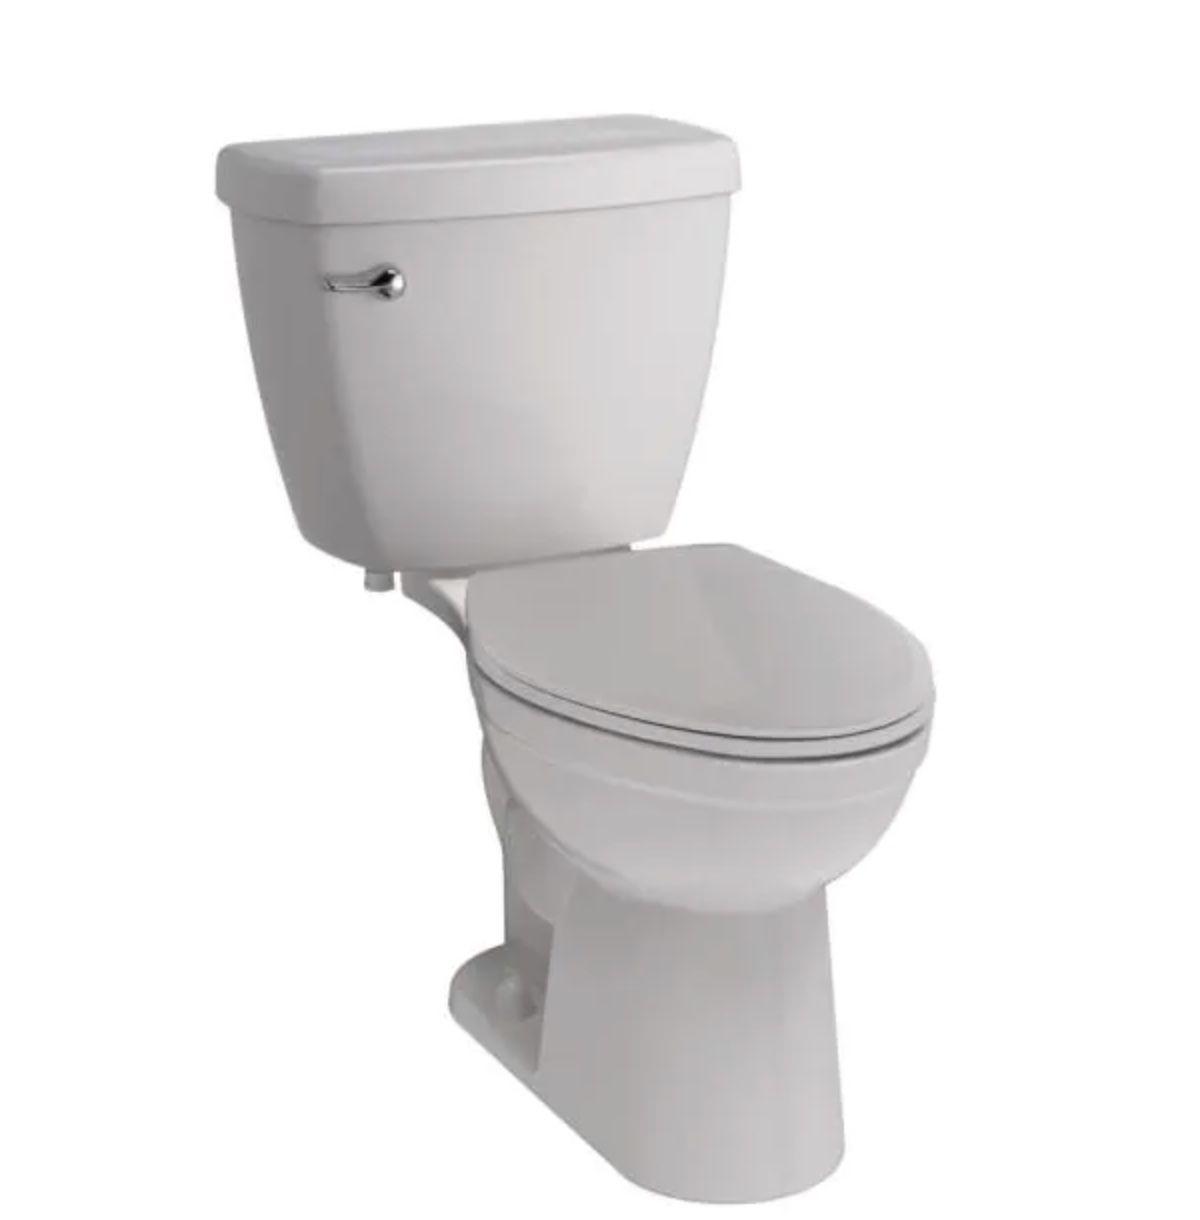 Foundations 2-piece Single Flush Elongated Toilet